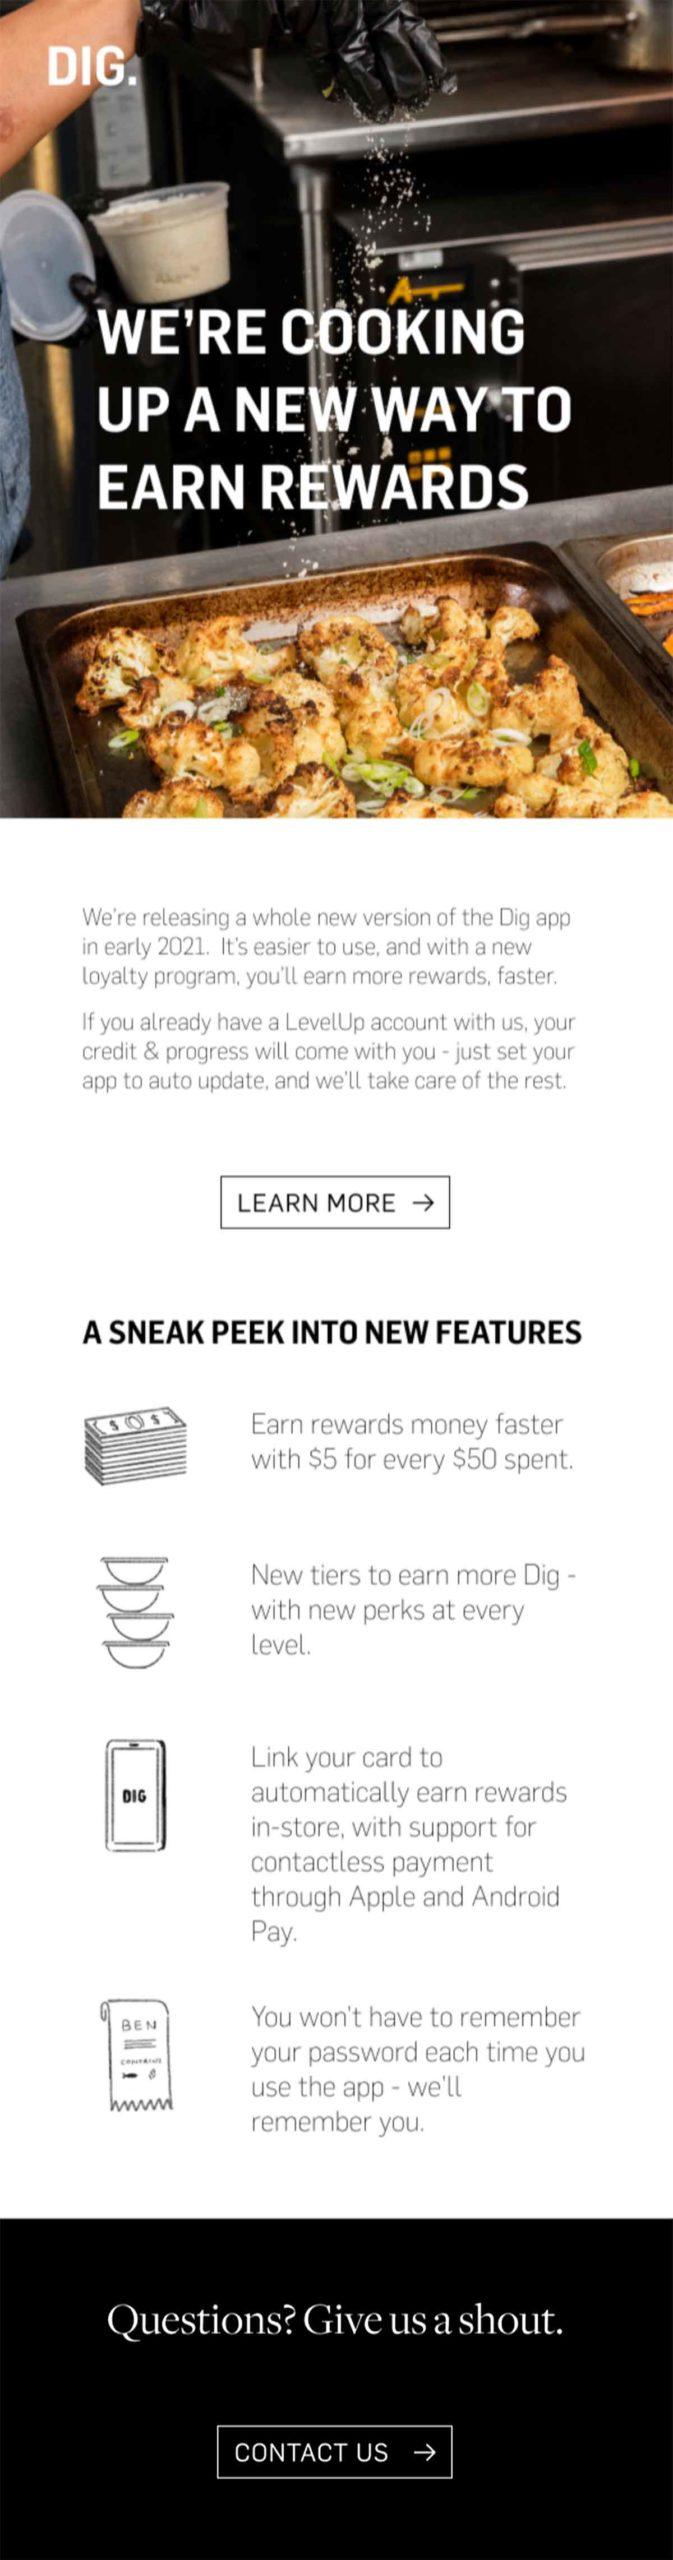 DIG INN new rewards email